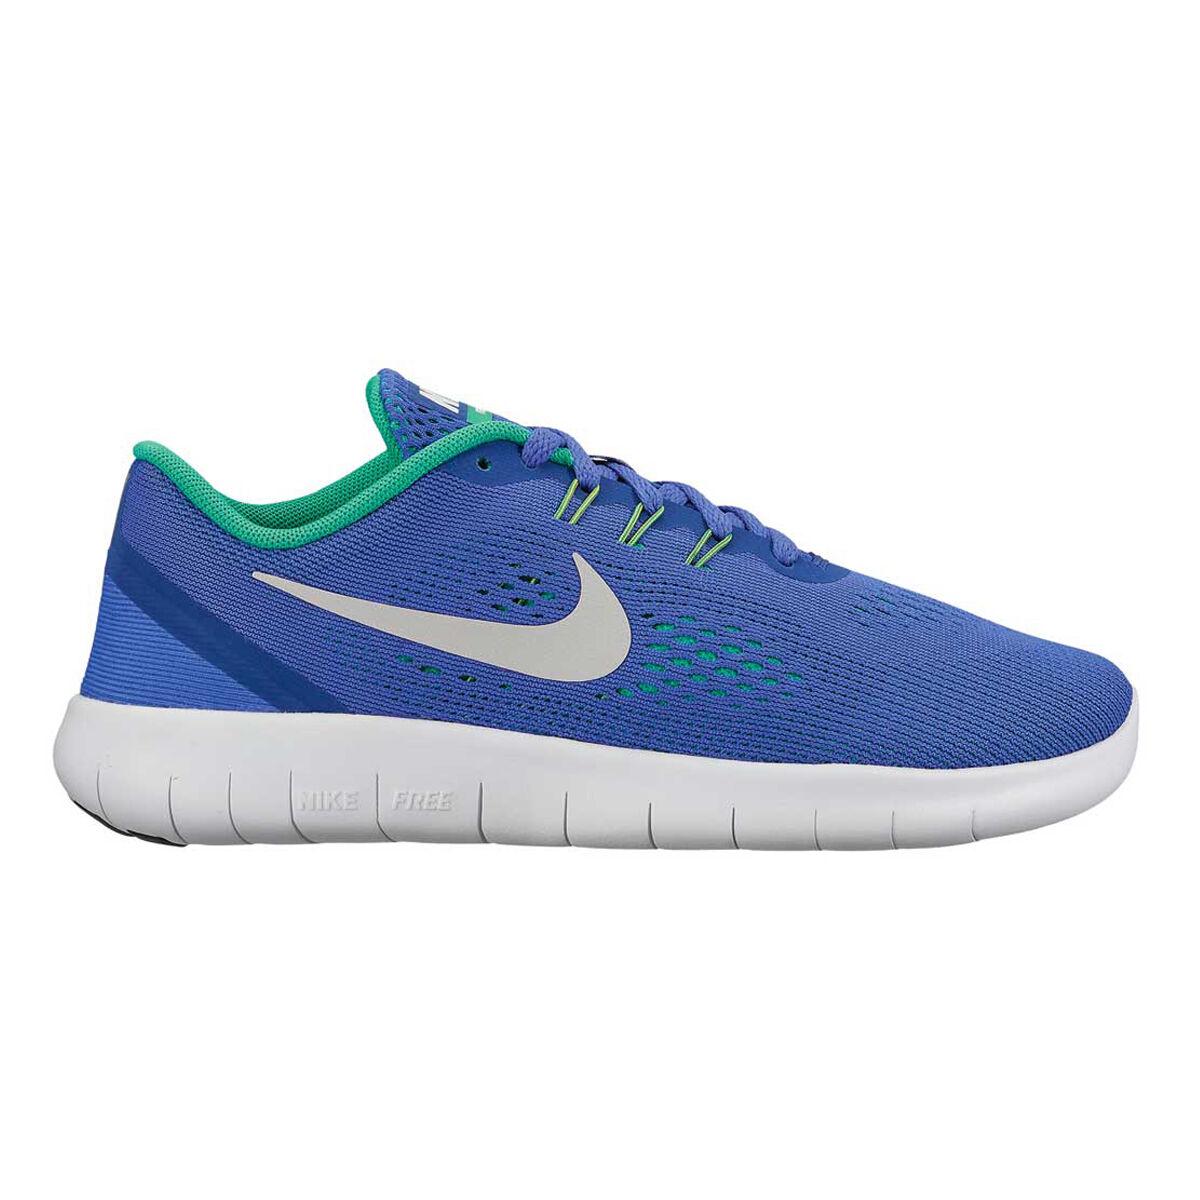 Nike Free Run Boys Running Shoes